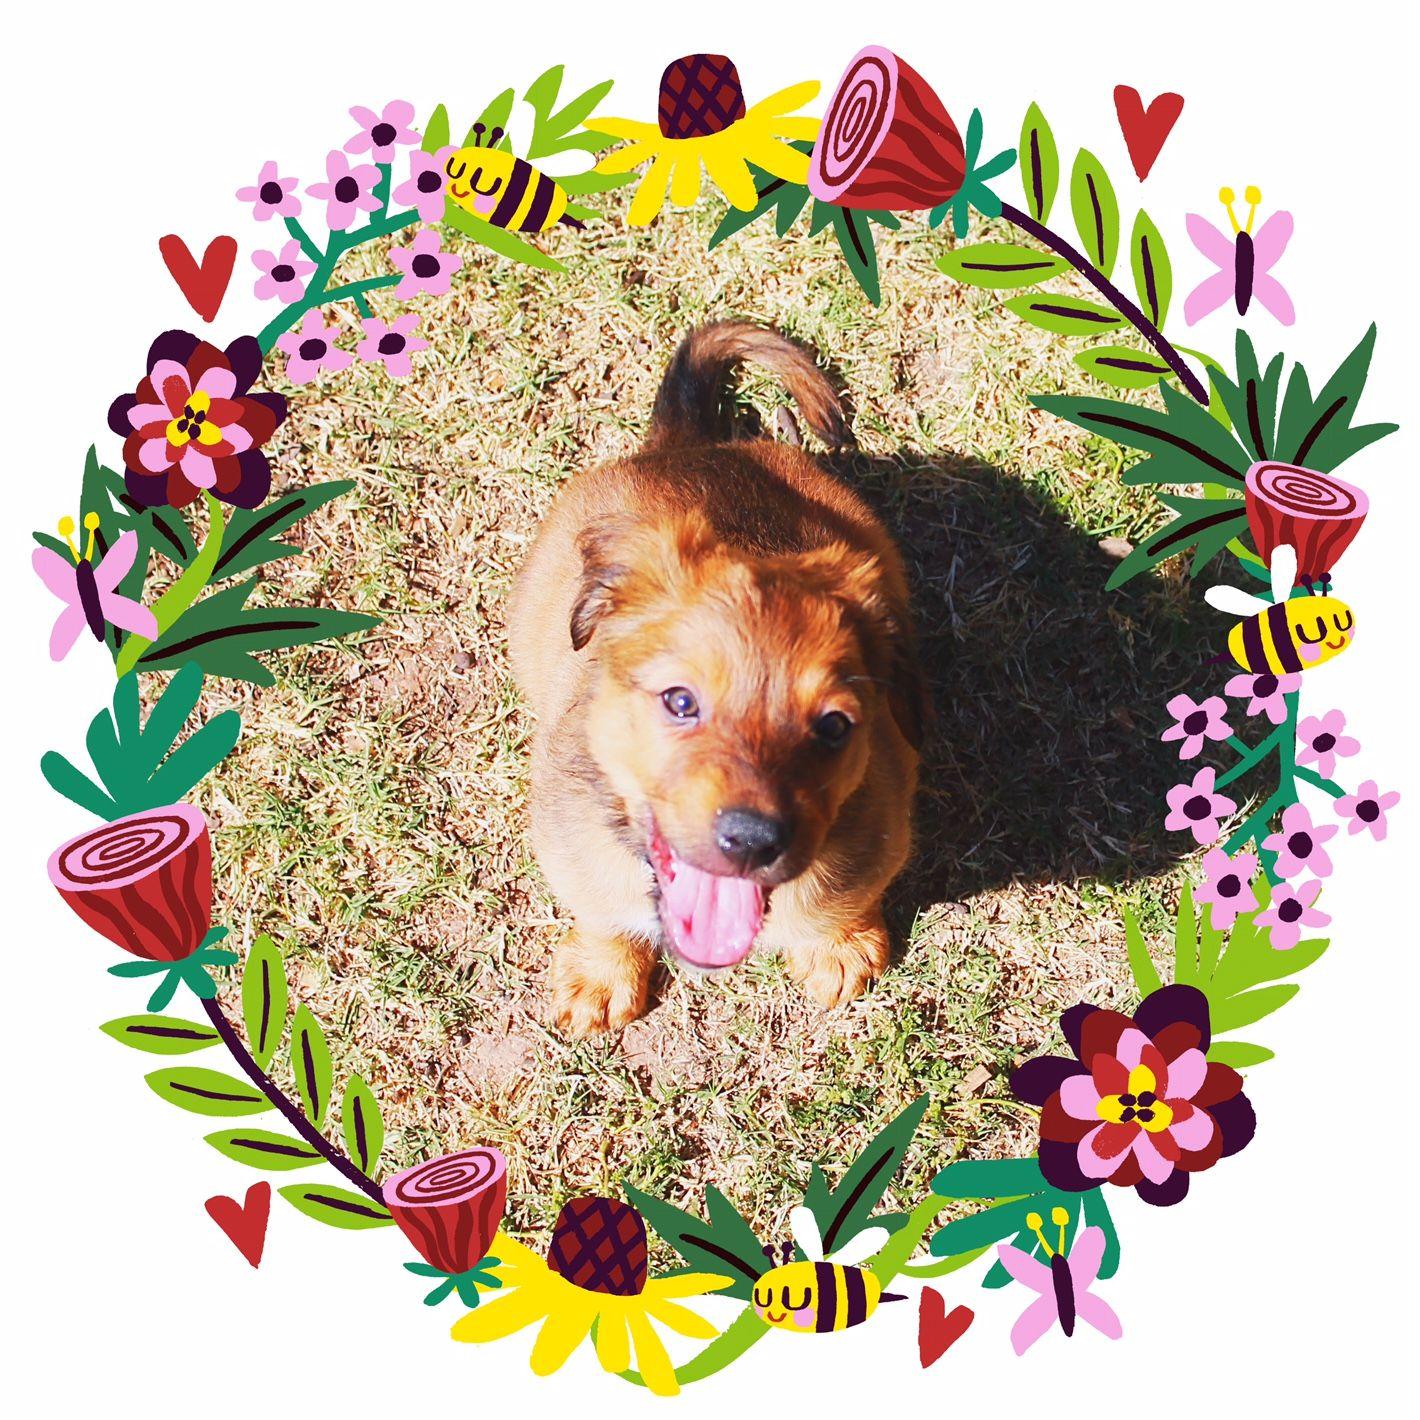 Australian Retriever dog for Adoption in Chandler, AZ. ADN